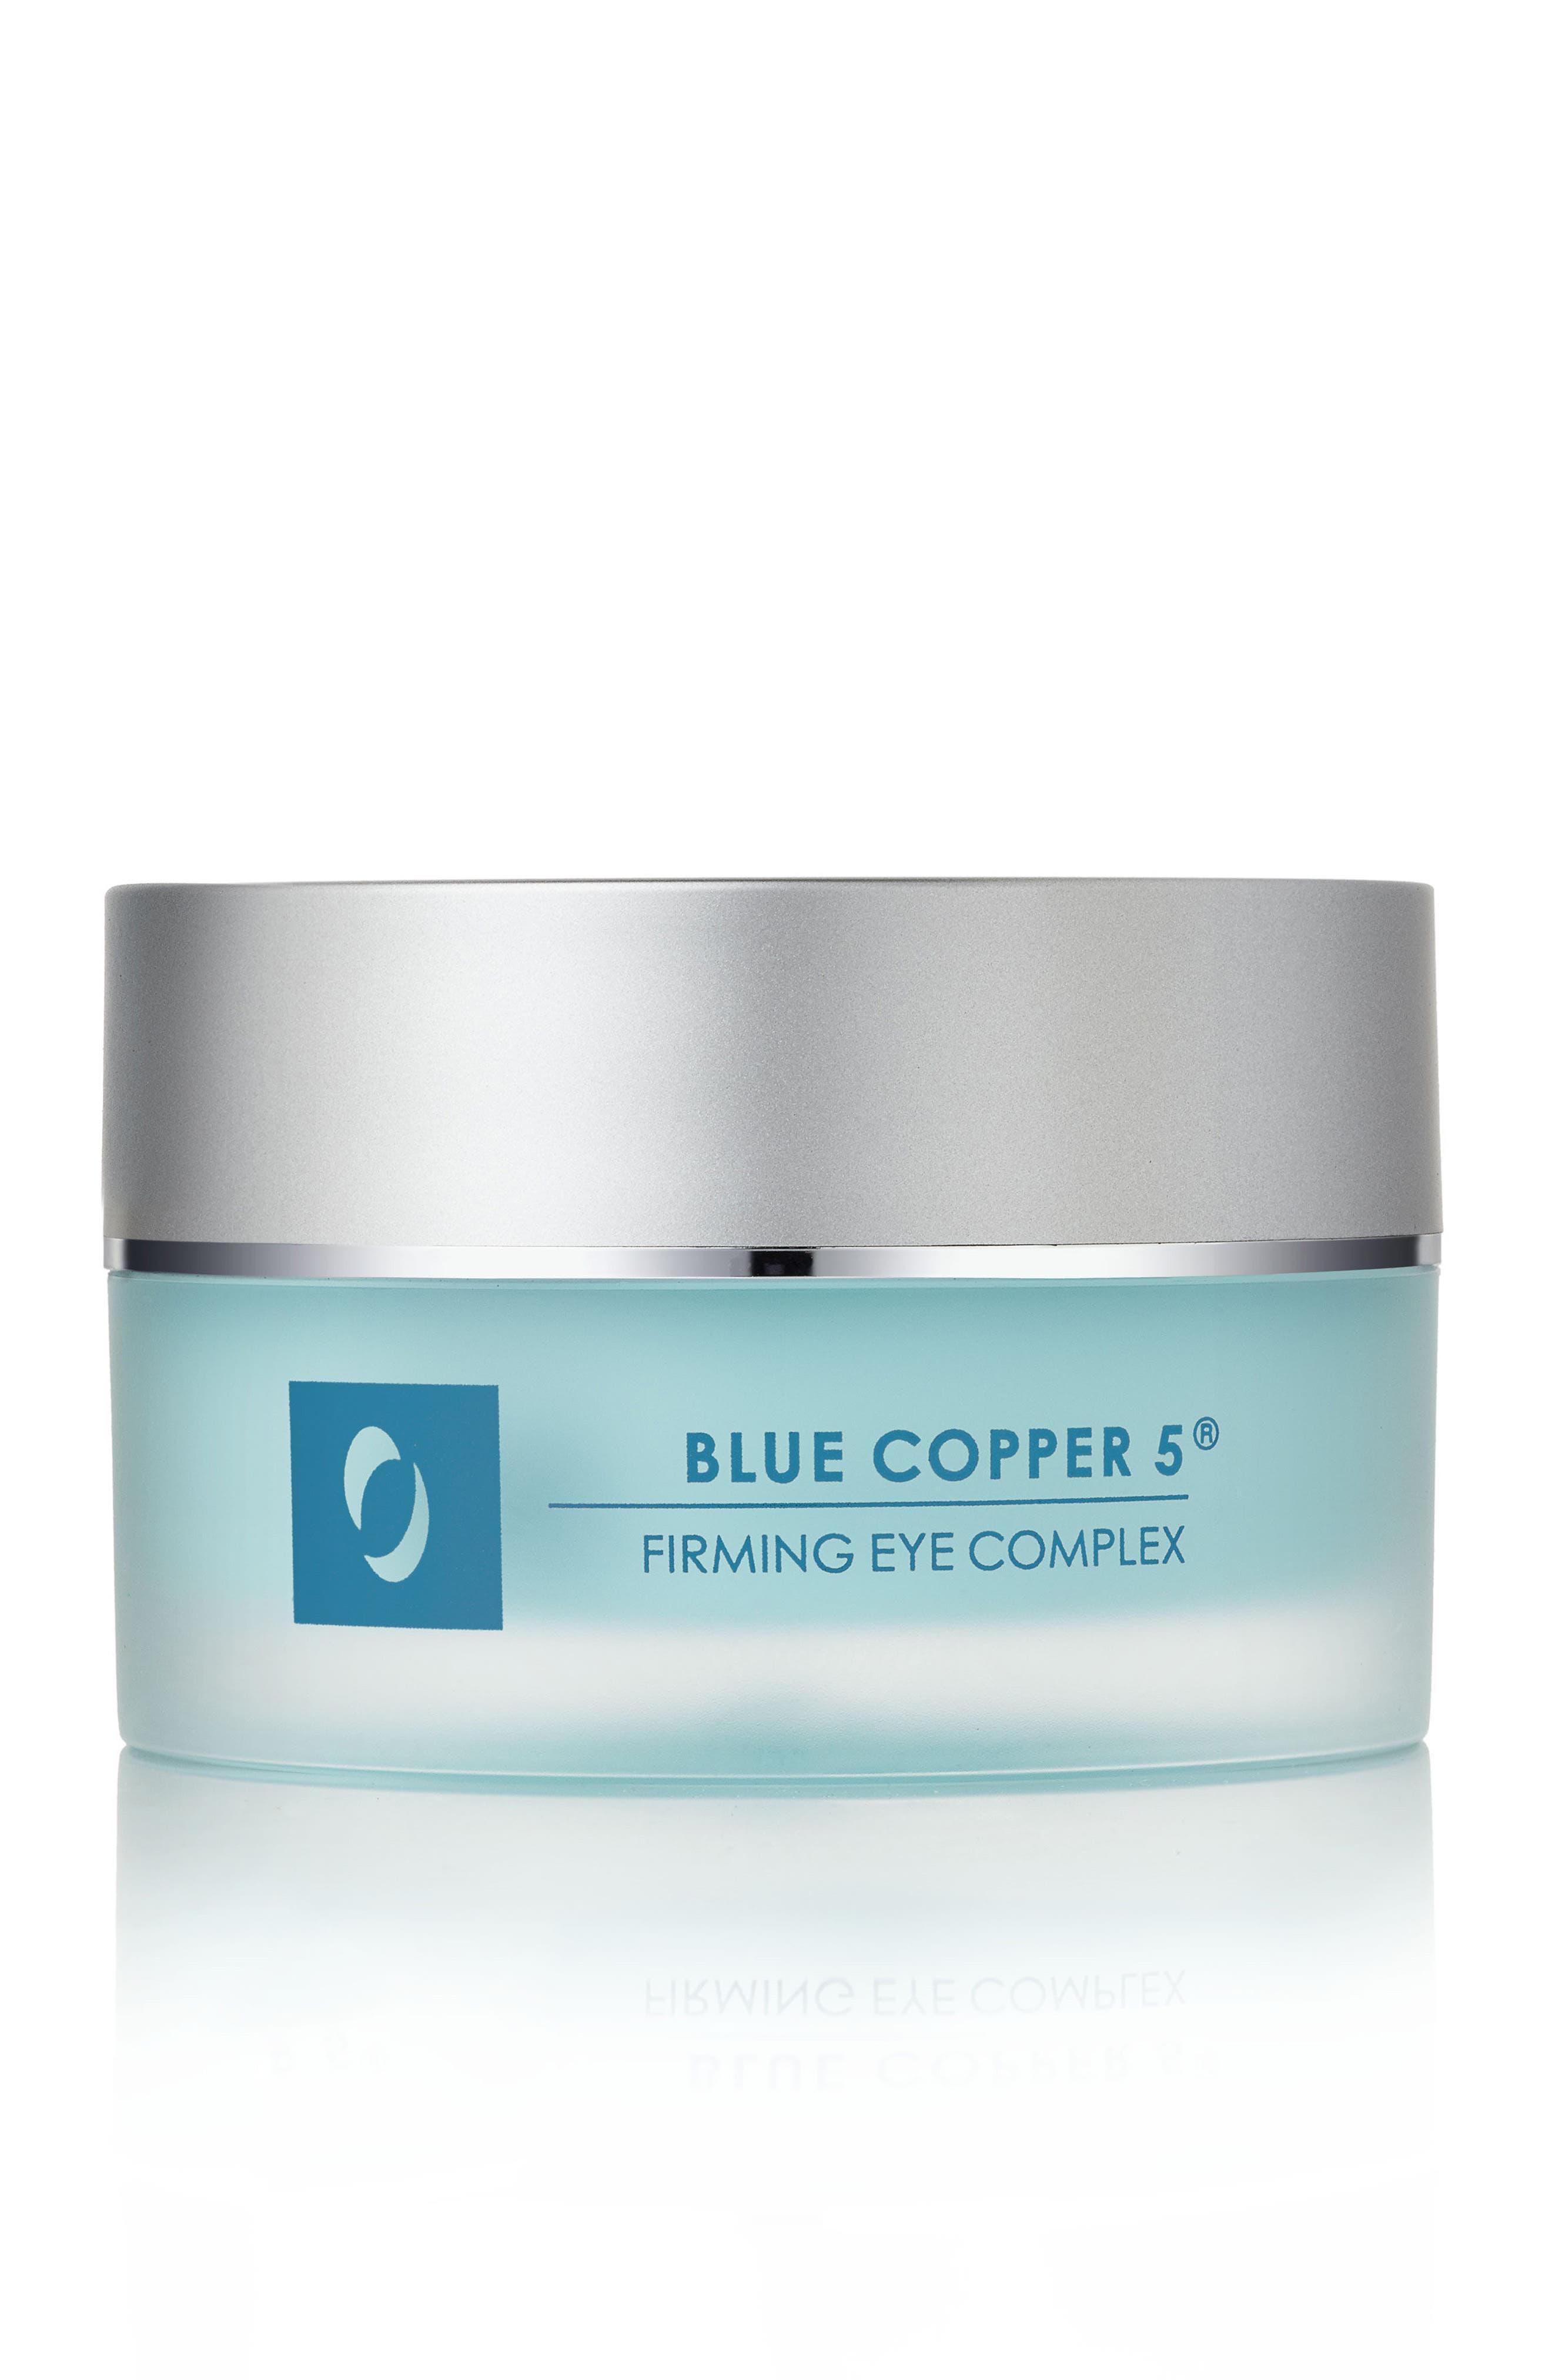 Blue Copper 5 Firming Eye Complex,                         Main,                         color, No Color